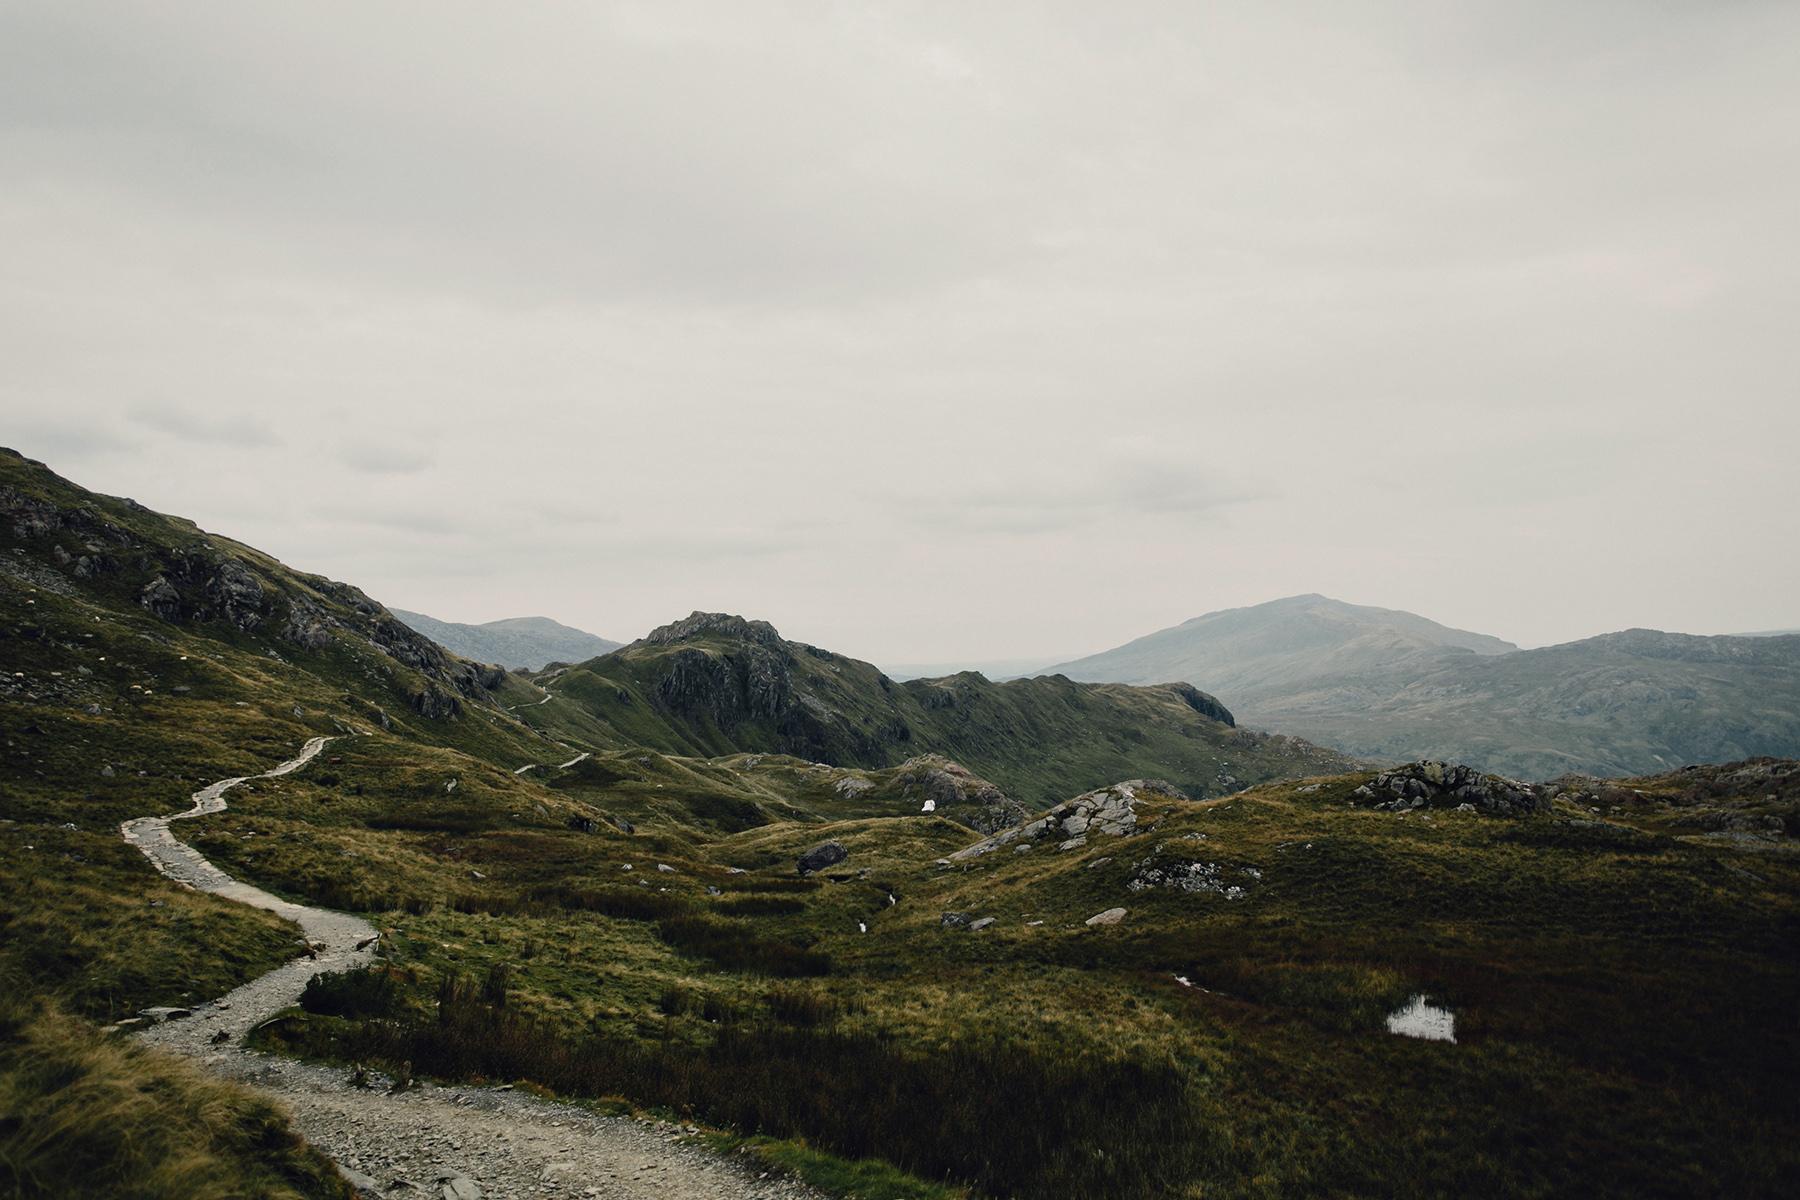 Mt-Snowdon-Hike-Photos-From-Peny-Pass-00221.jpg